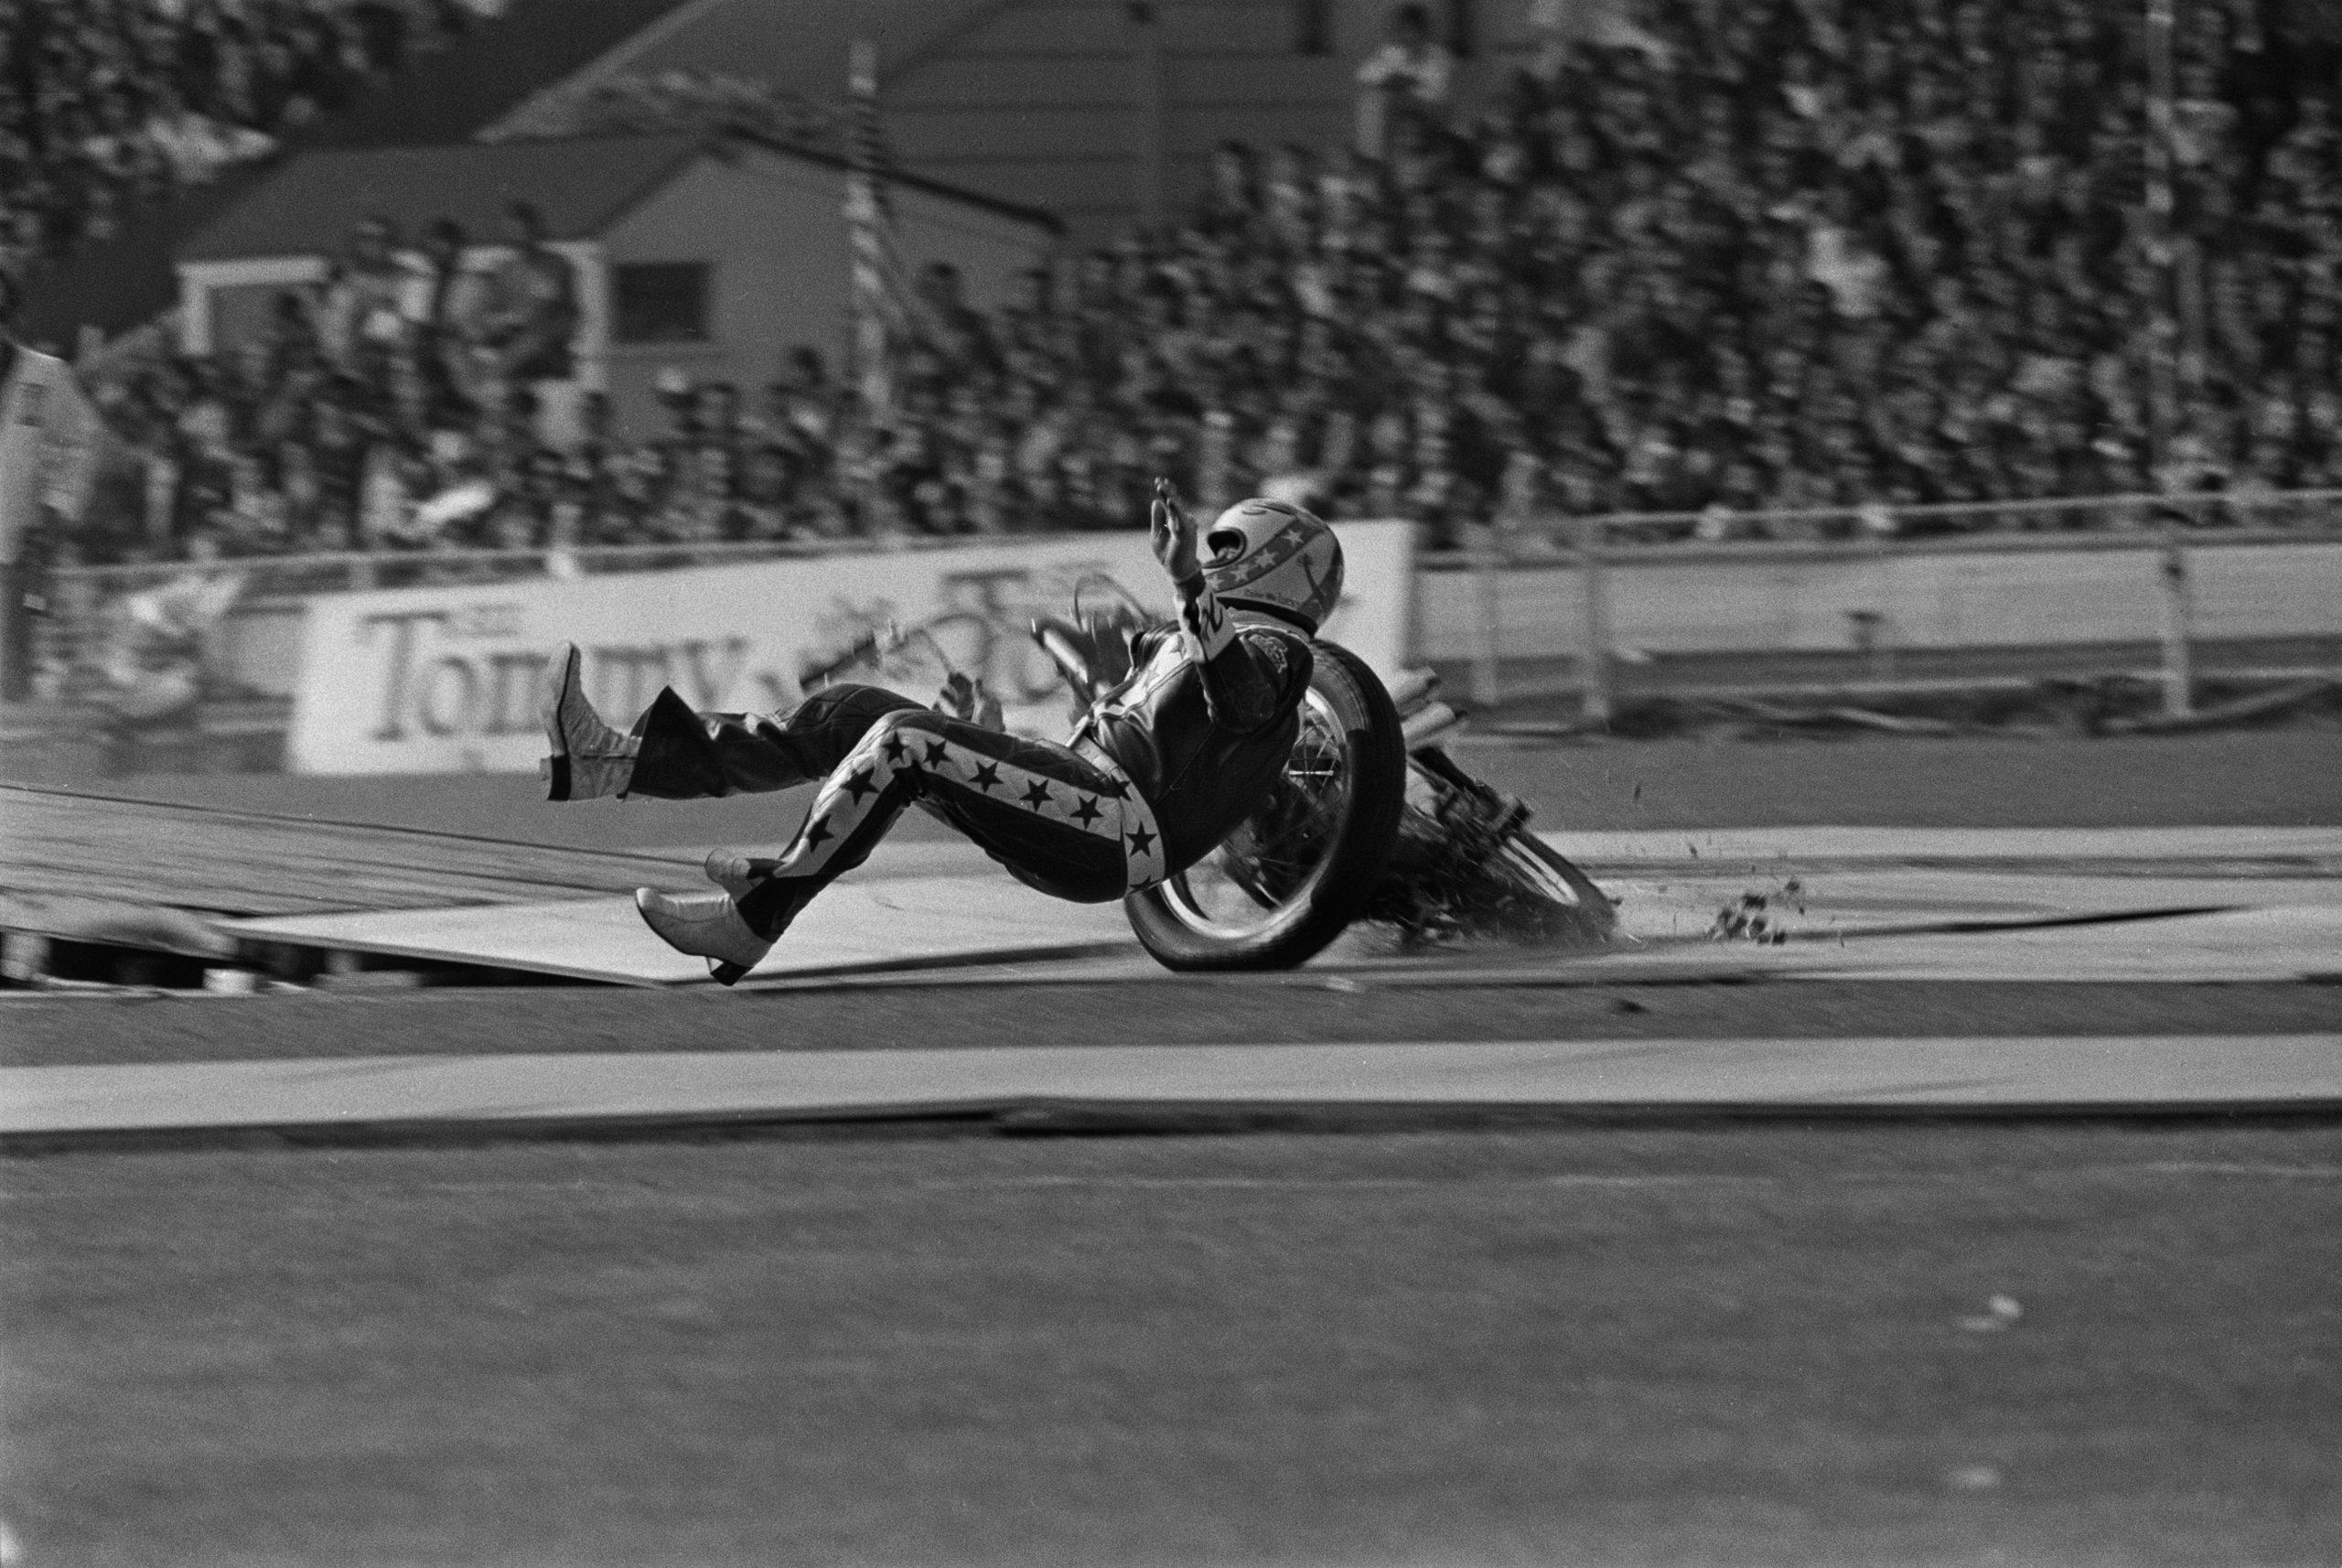 Evel Knievel Landing off his Motorcycle Wembley Crash